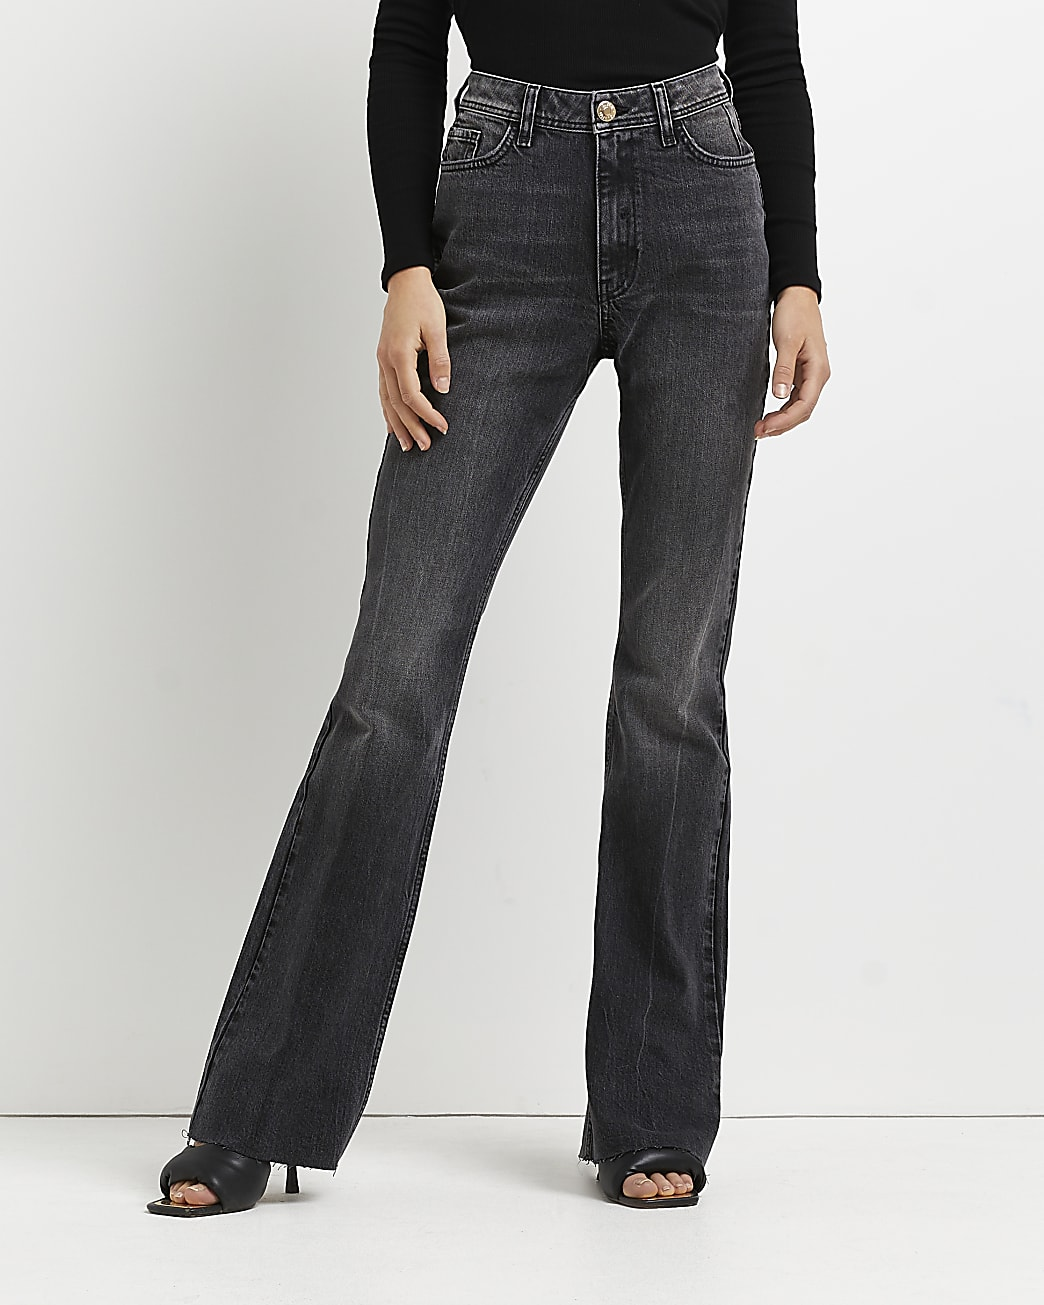 Black high waisted bum sculpt flared jeans